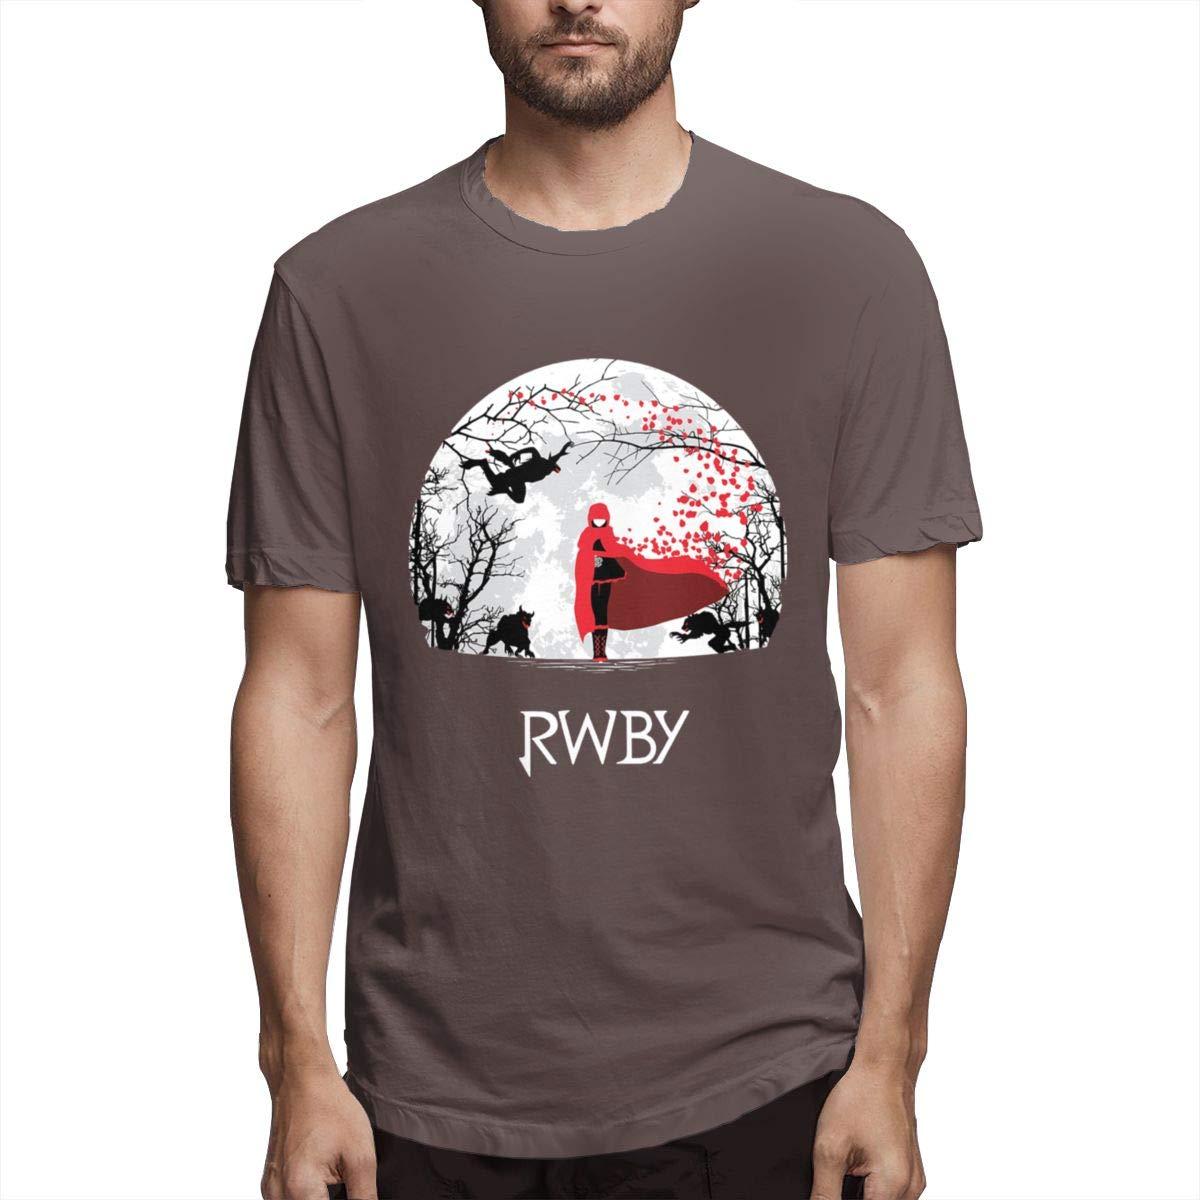 VIIHAHN Men Design RWBY Athletic Round Neck Short Sleeve T-Shirts